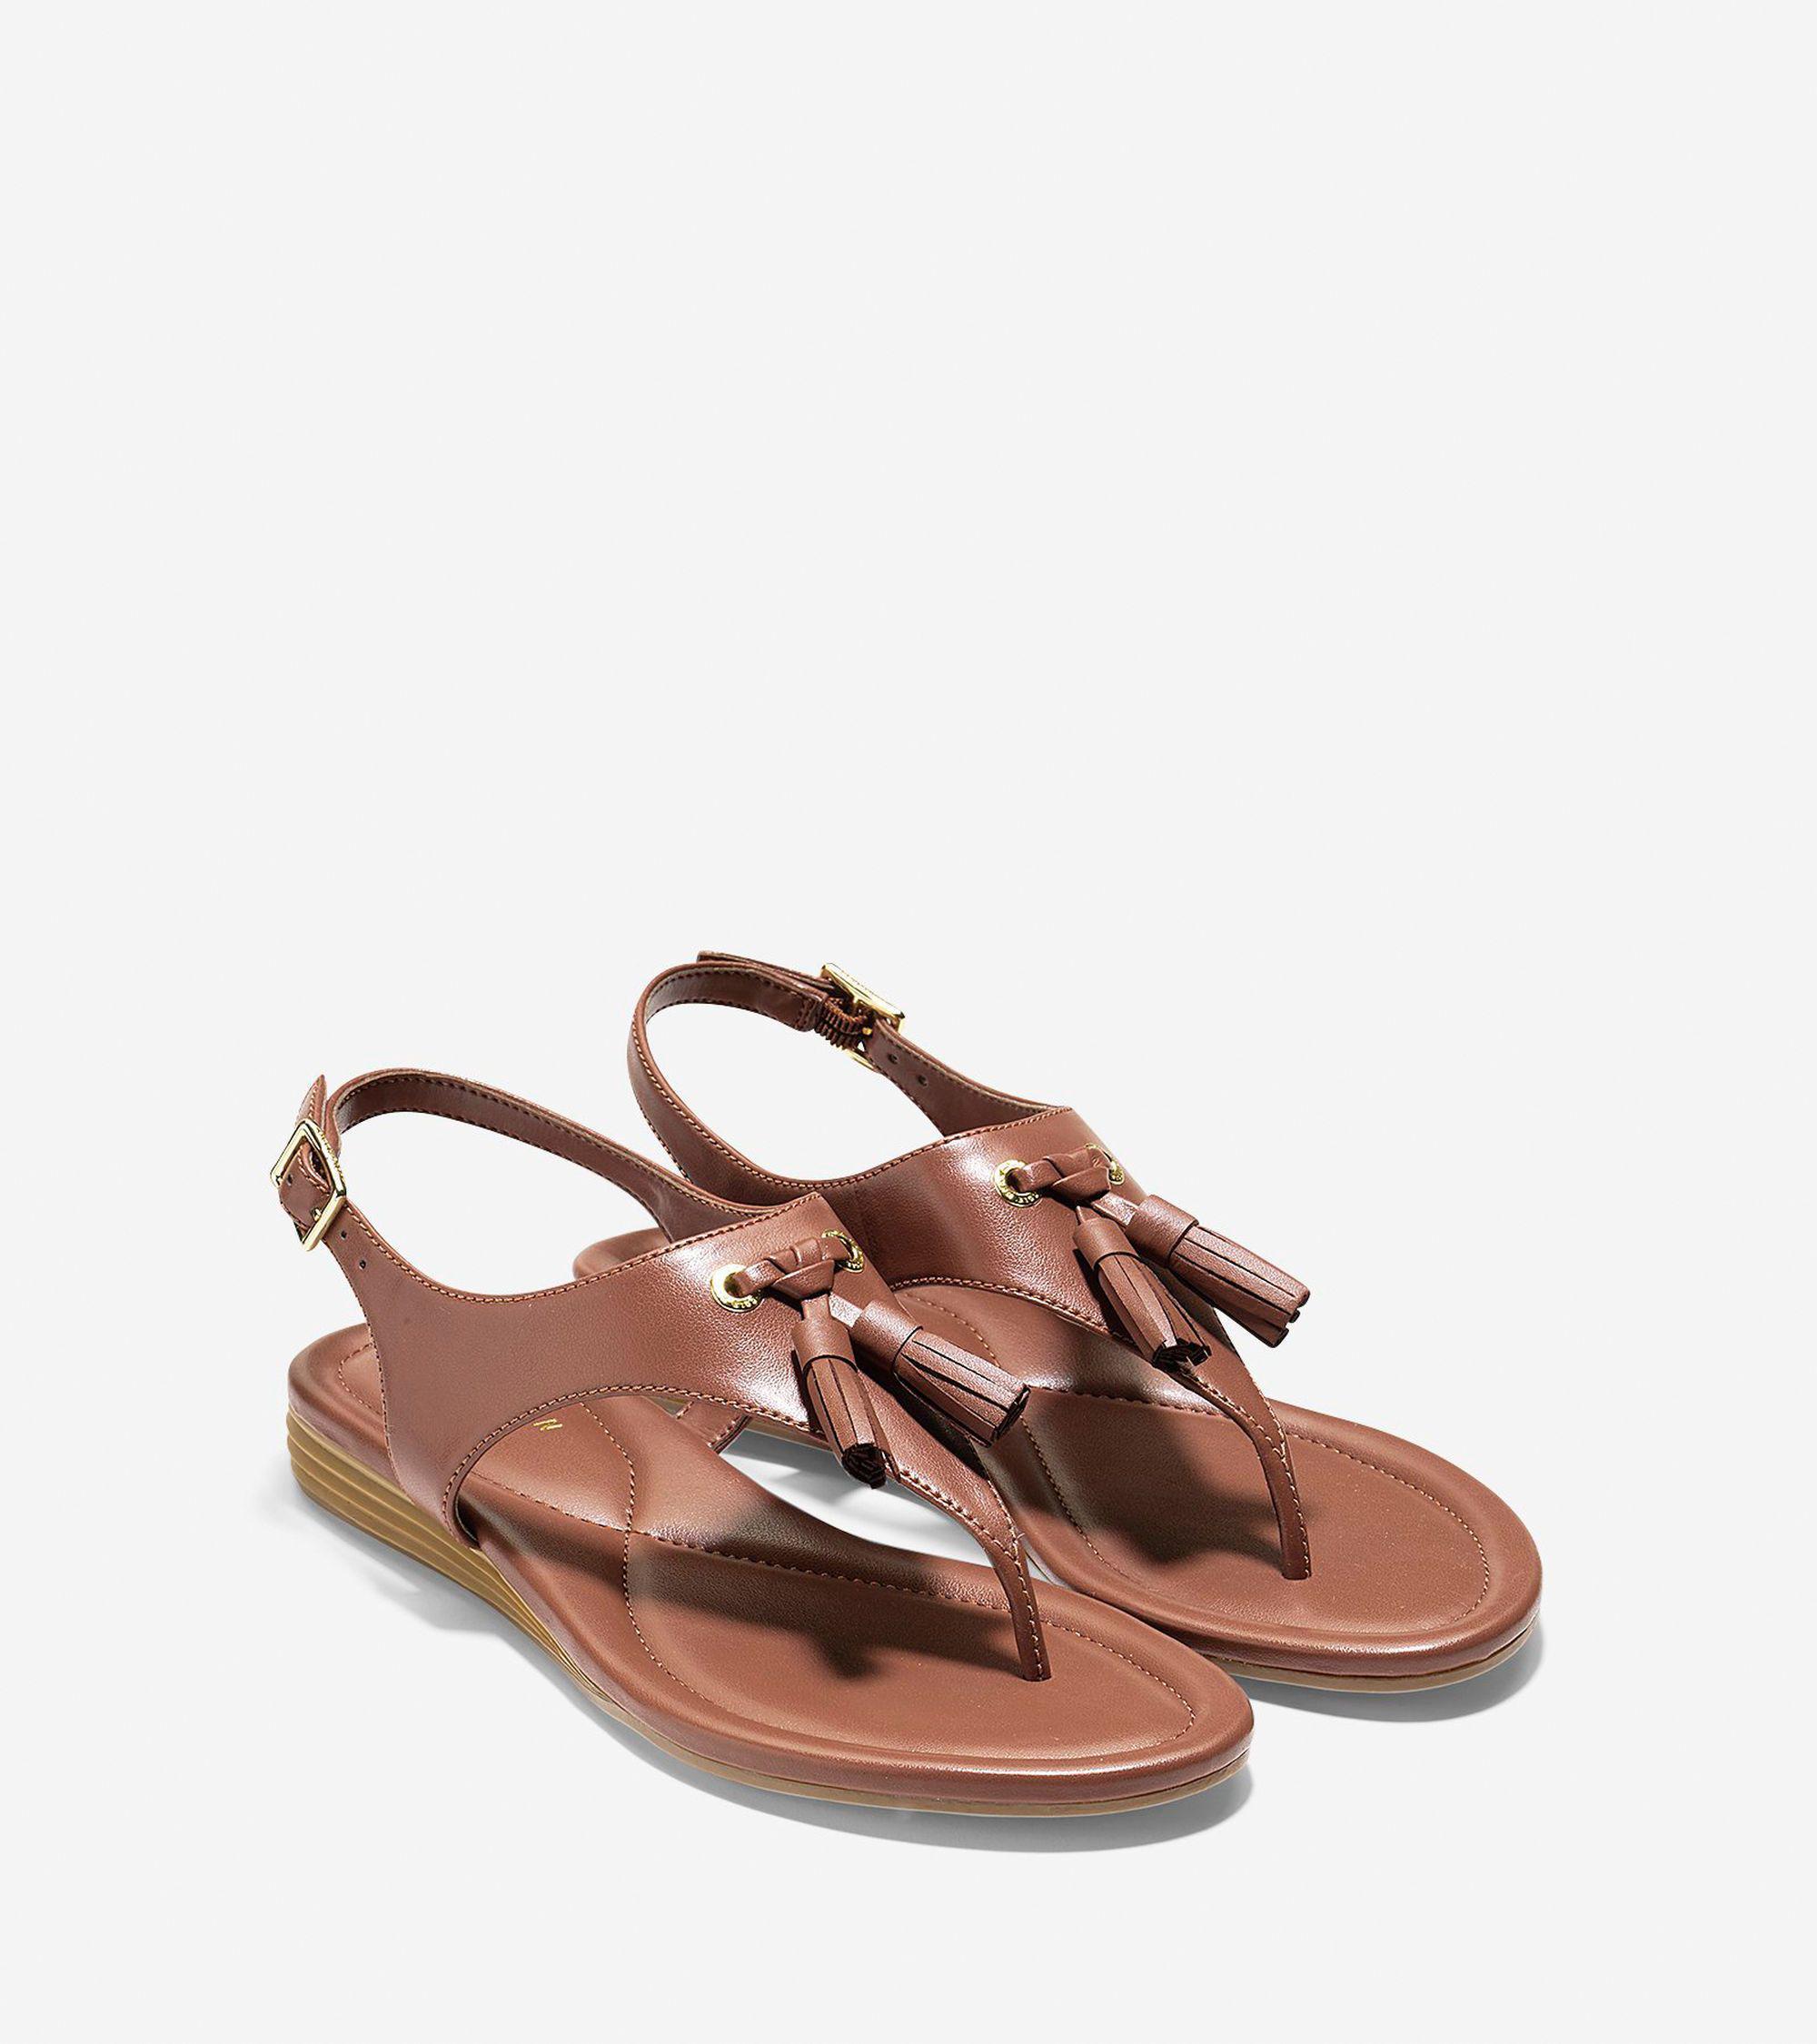 7ea025125af Lyst - Cole Haan Womens Rona Split Toe Casual Slingback Sandals in Brown